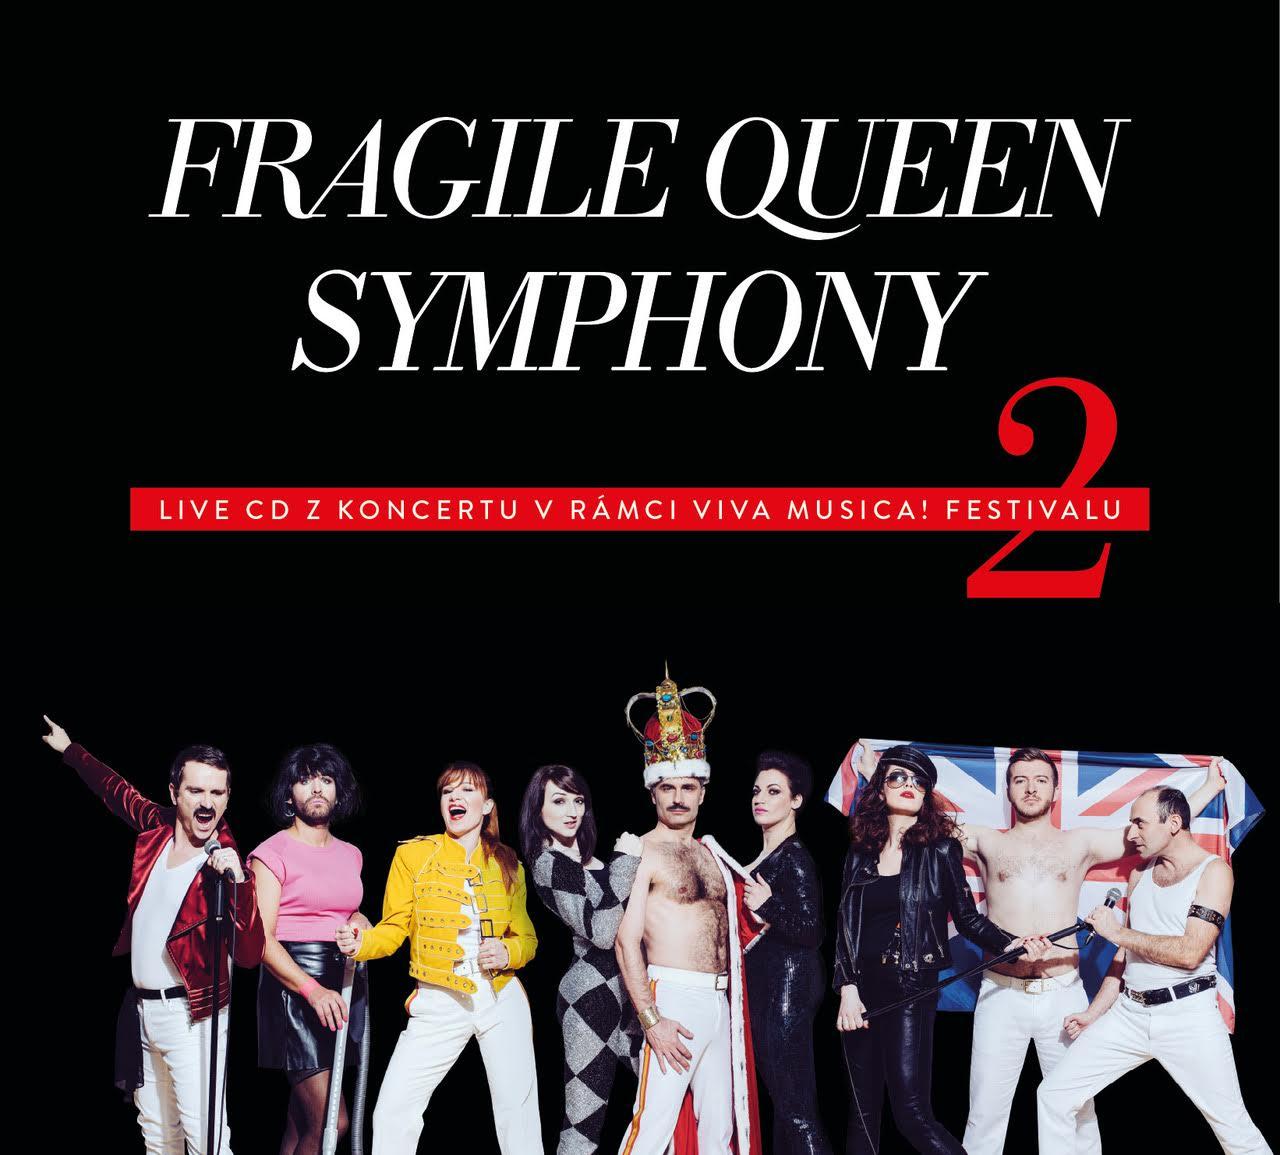 Fragile - CD Fragile Queen Symphony 2